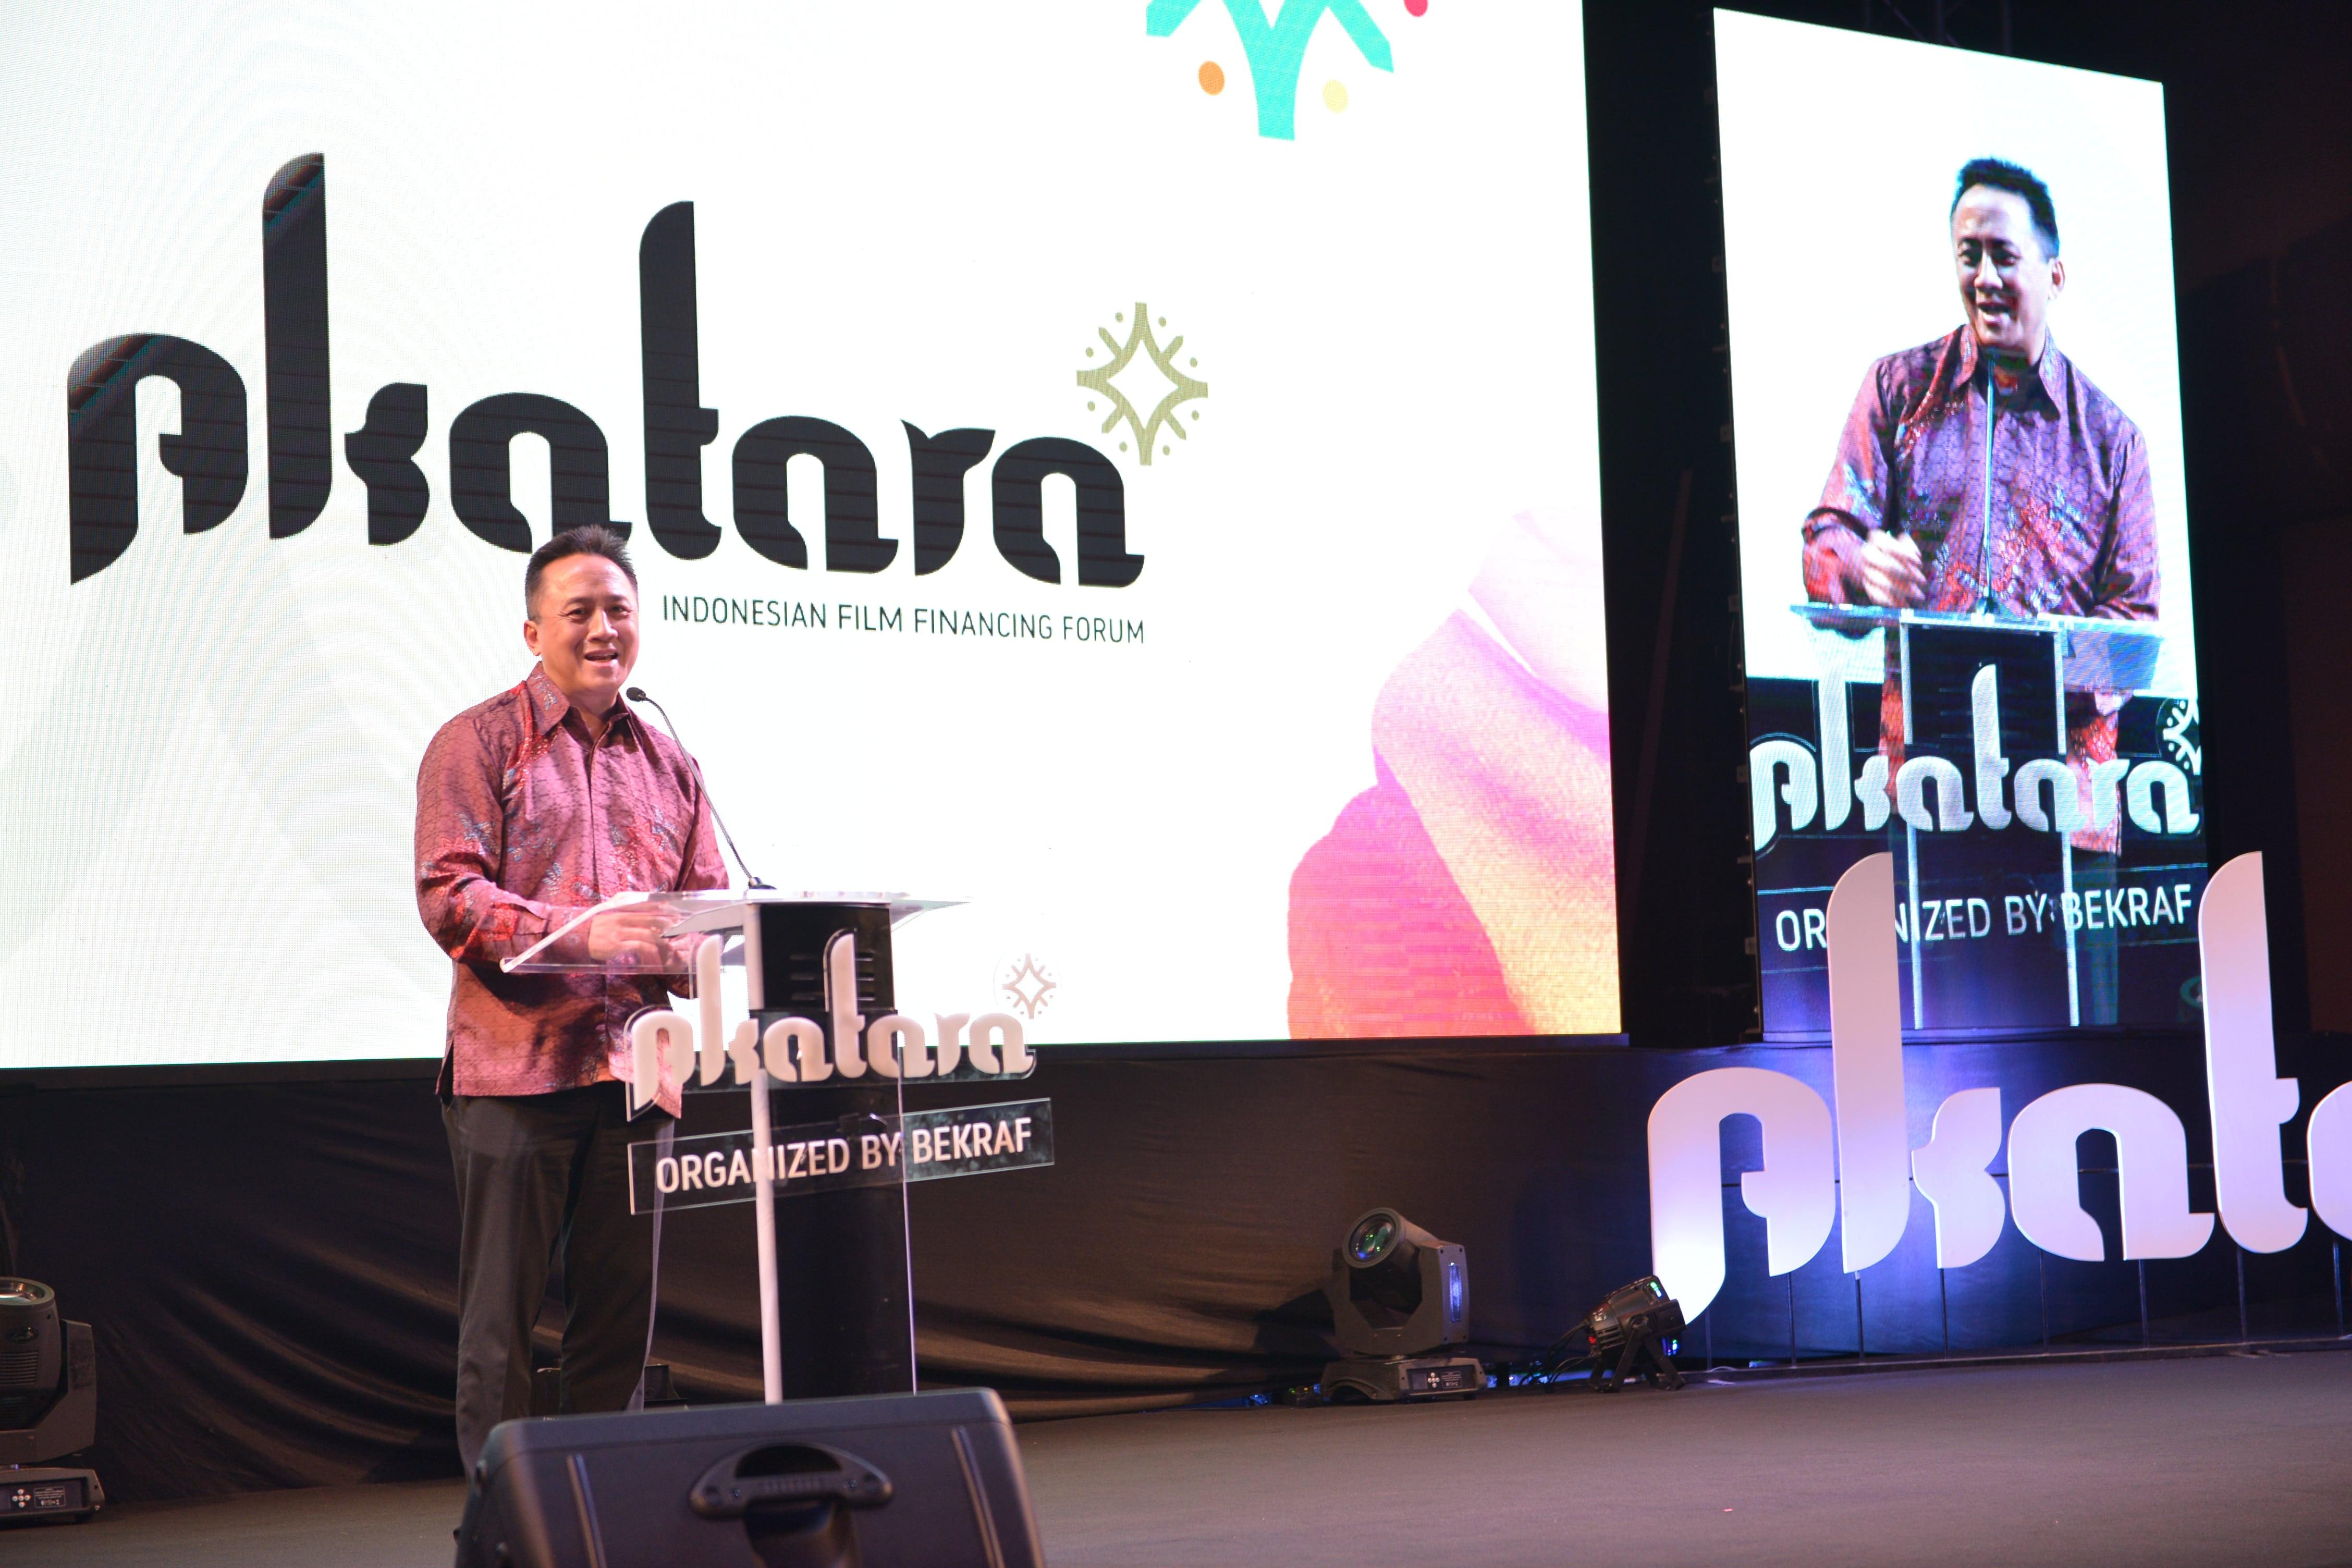 Akatara 2017